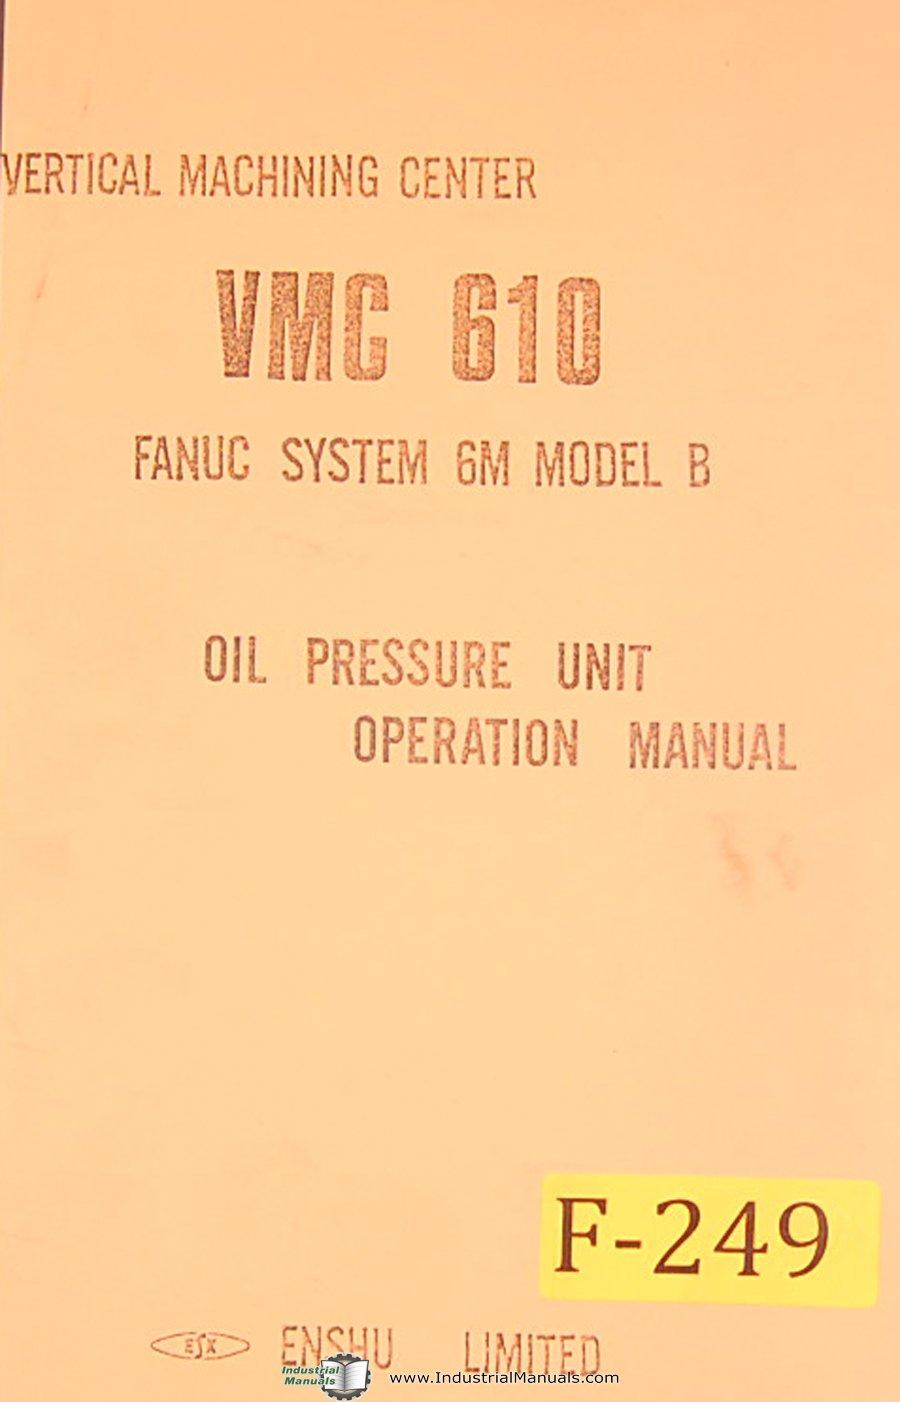 Enshu VMC 610, Fanuc System 6M Model B, Oil Pressure Unit, Operations Manual